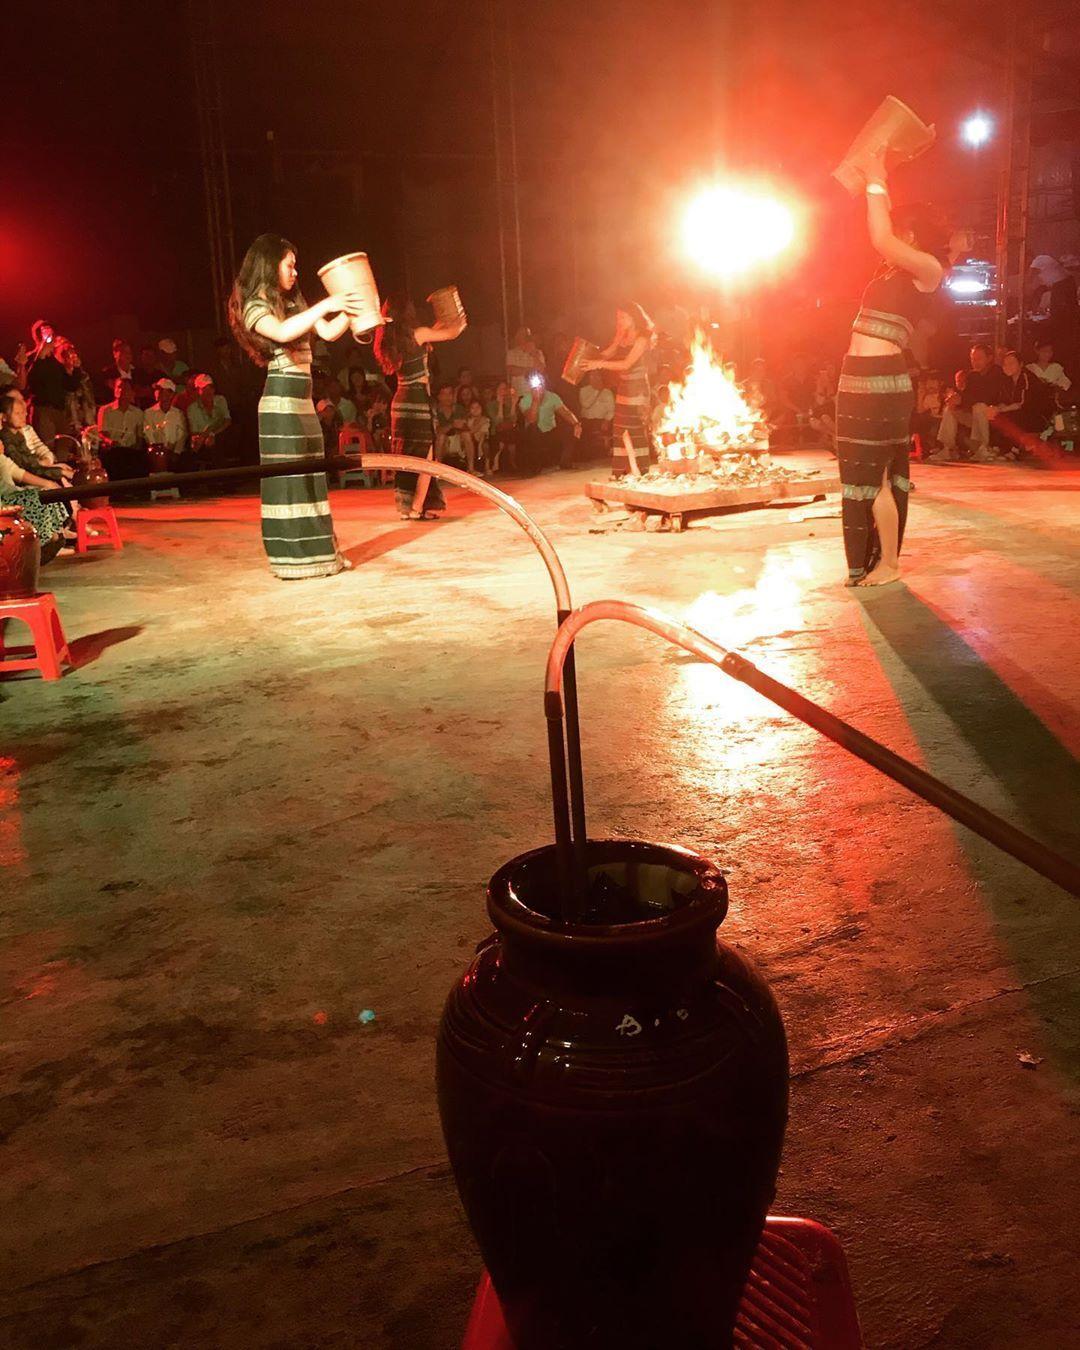 liangbiang-dalat-15